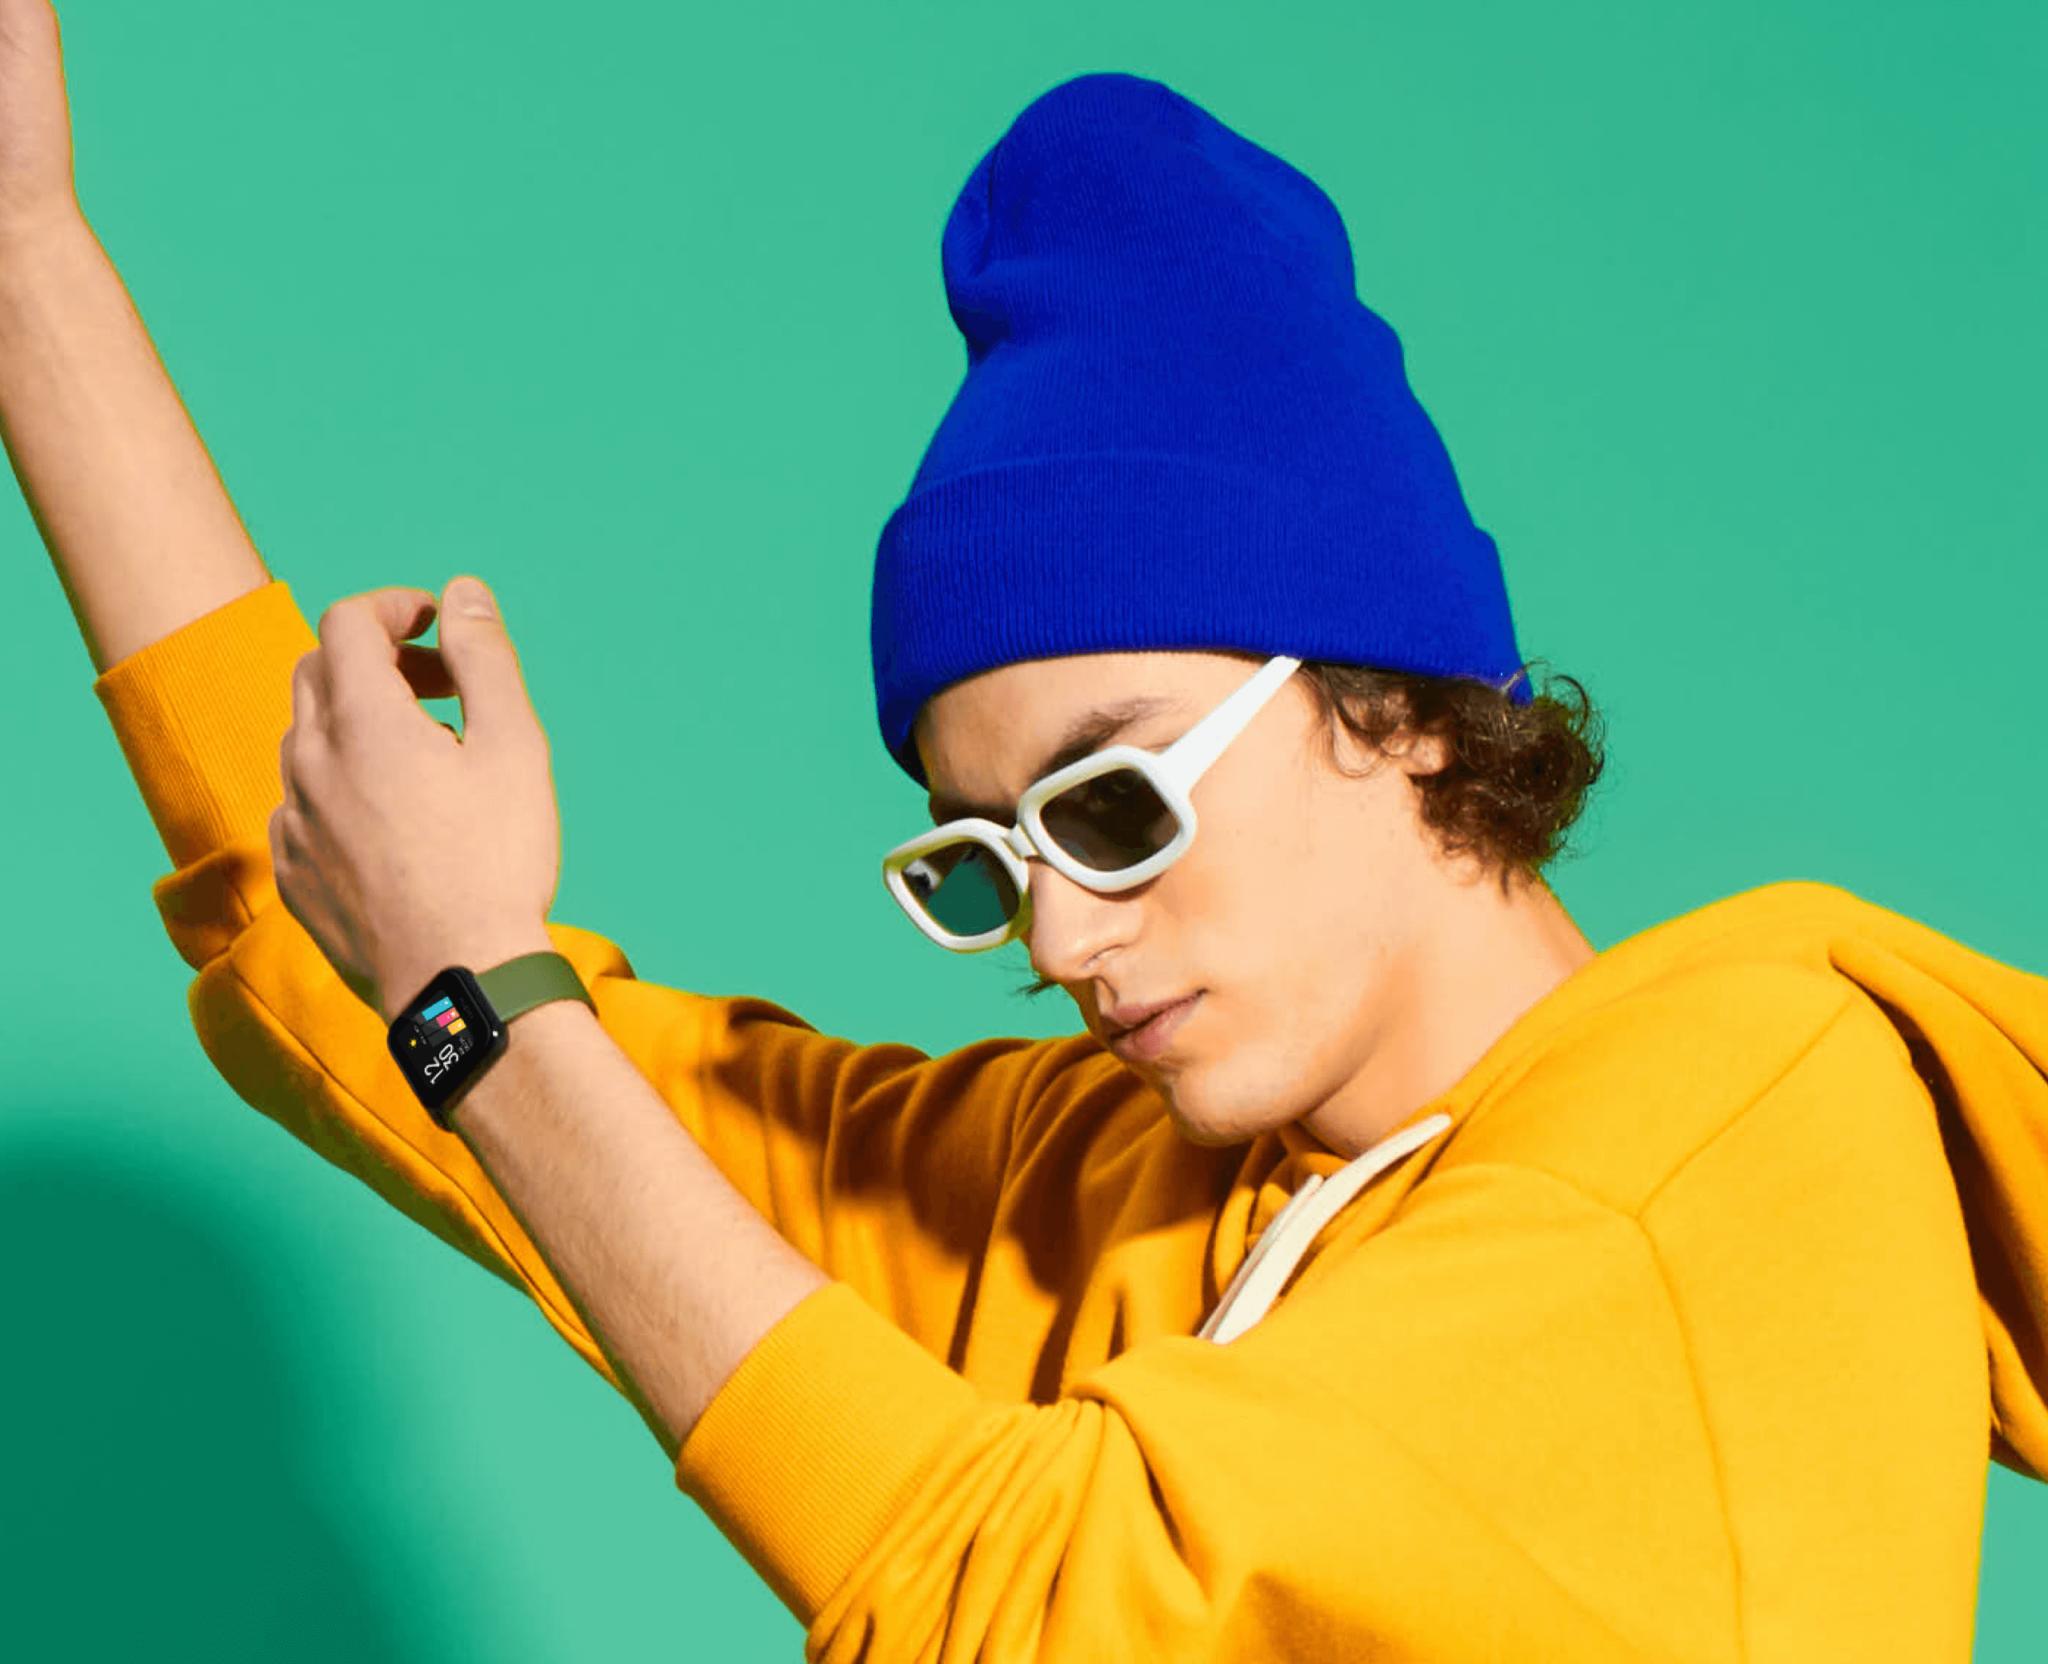 chico-joven-persona-vistiendo-realme-watch-reloj-inteligente-